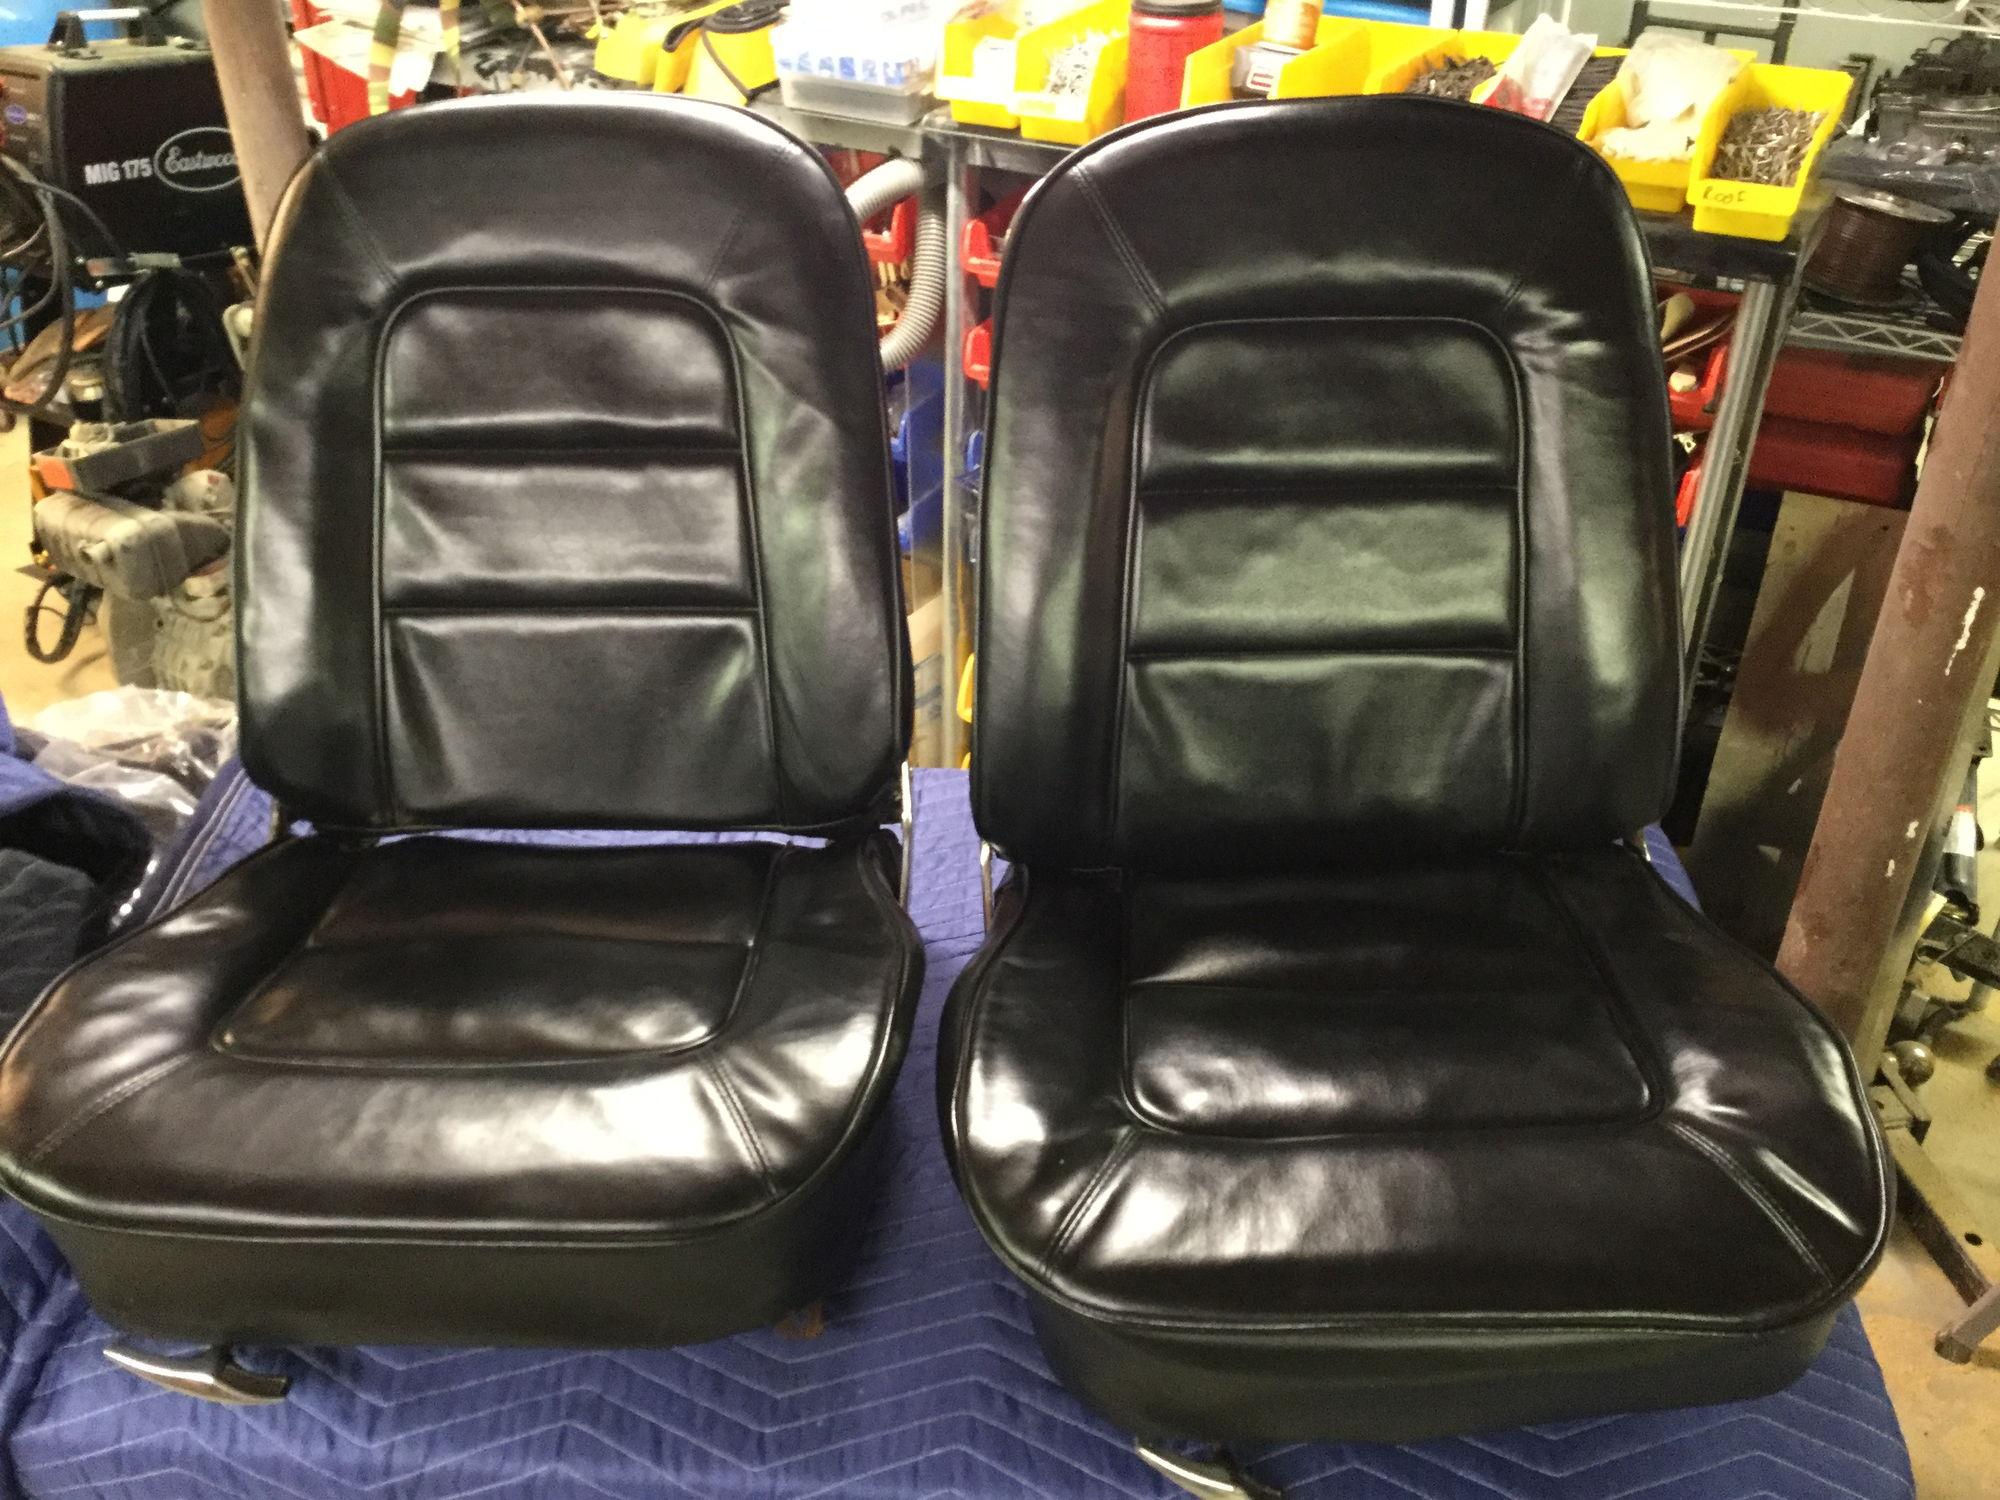 How much are seats worth? - CorvetteForum - Chevrolet Corvette Forum ...